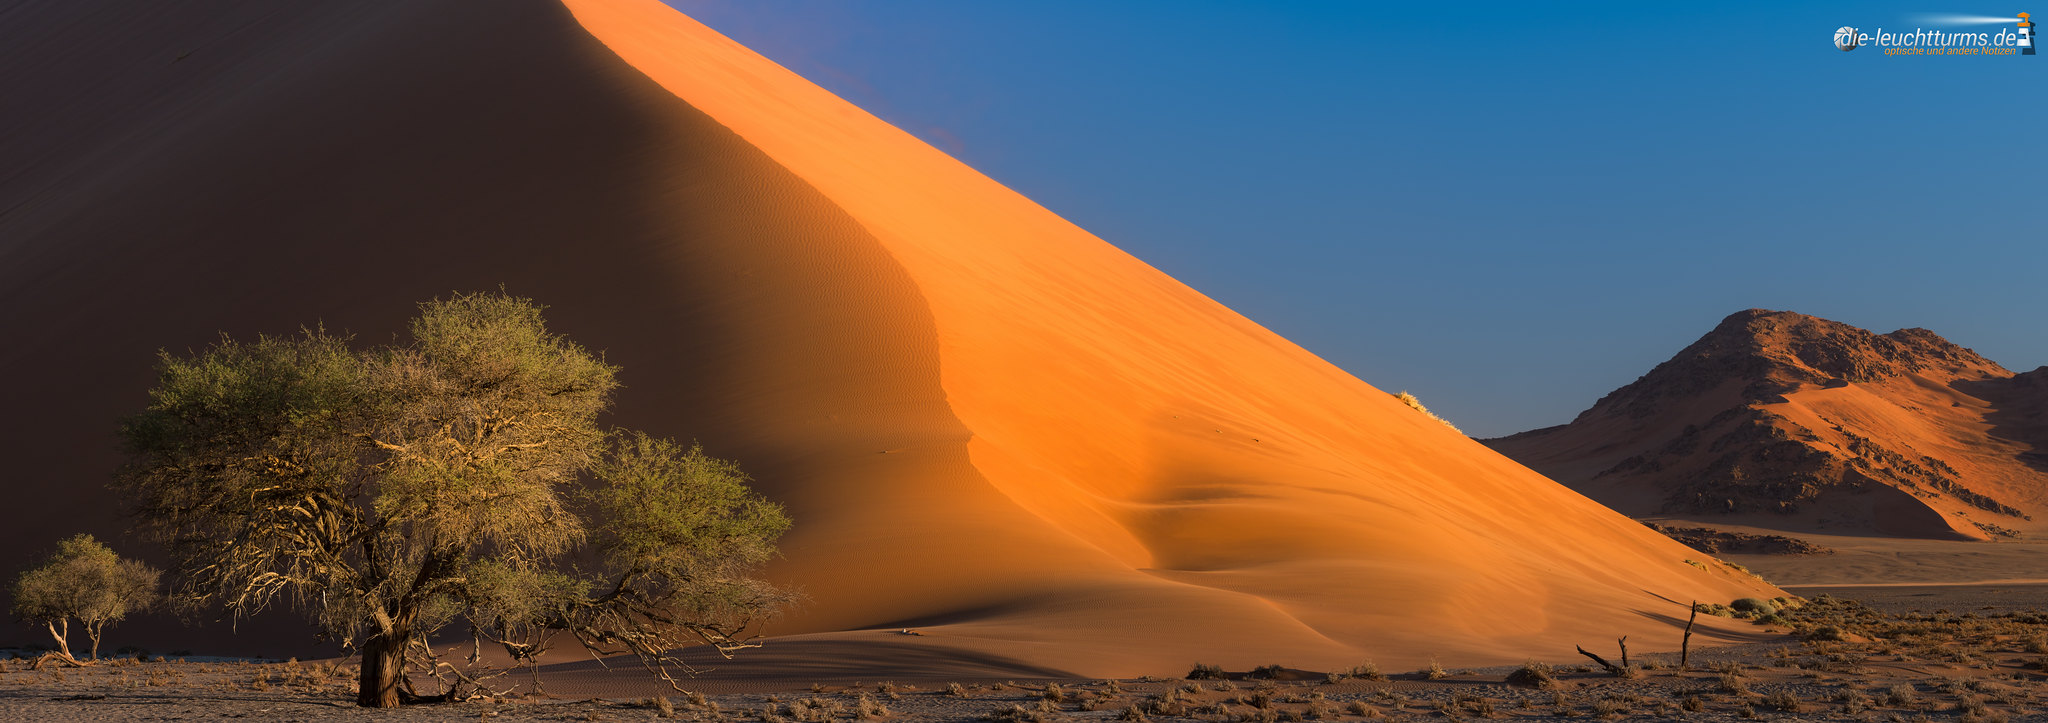 Glowing Dune